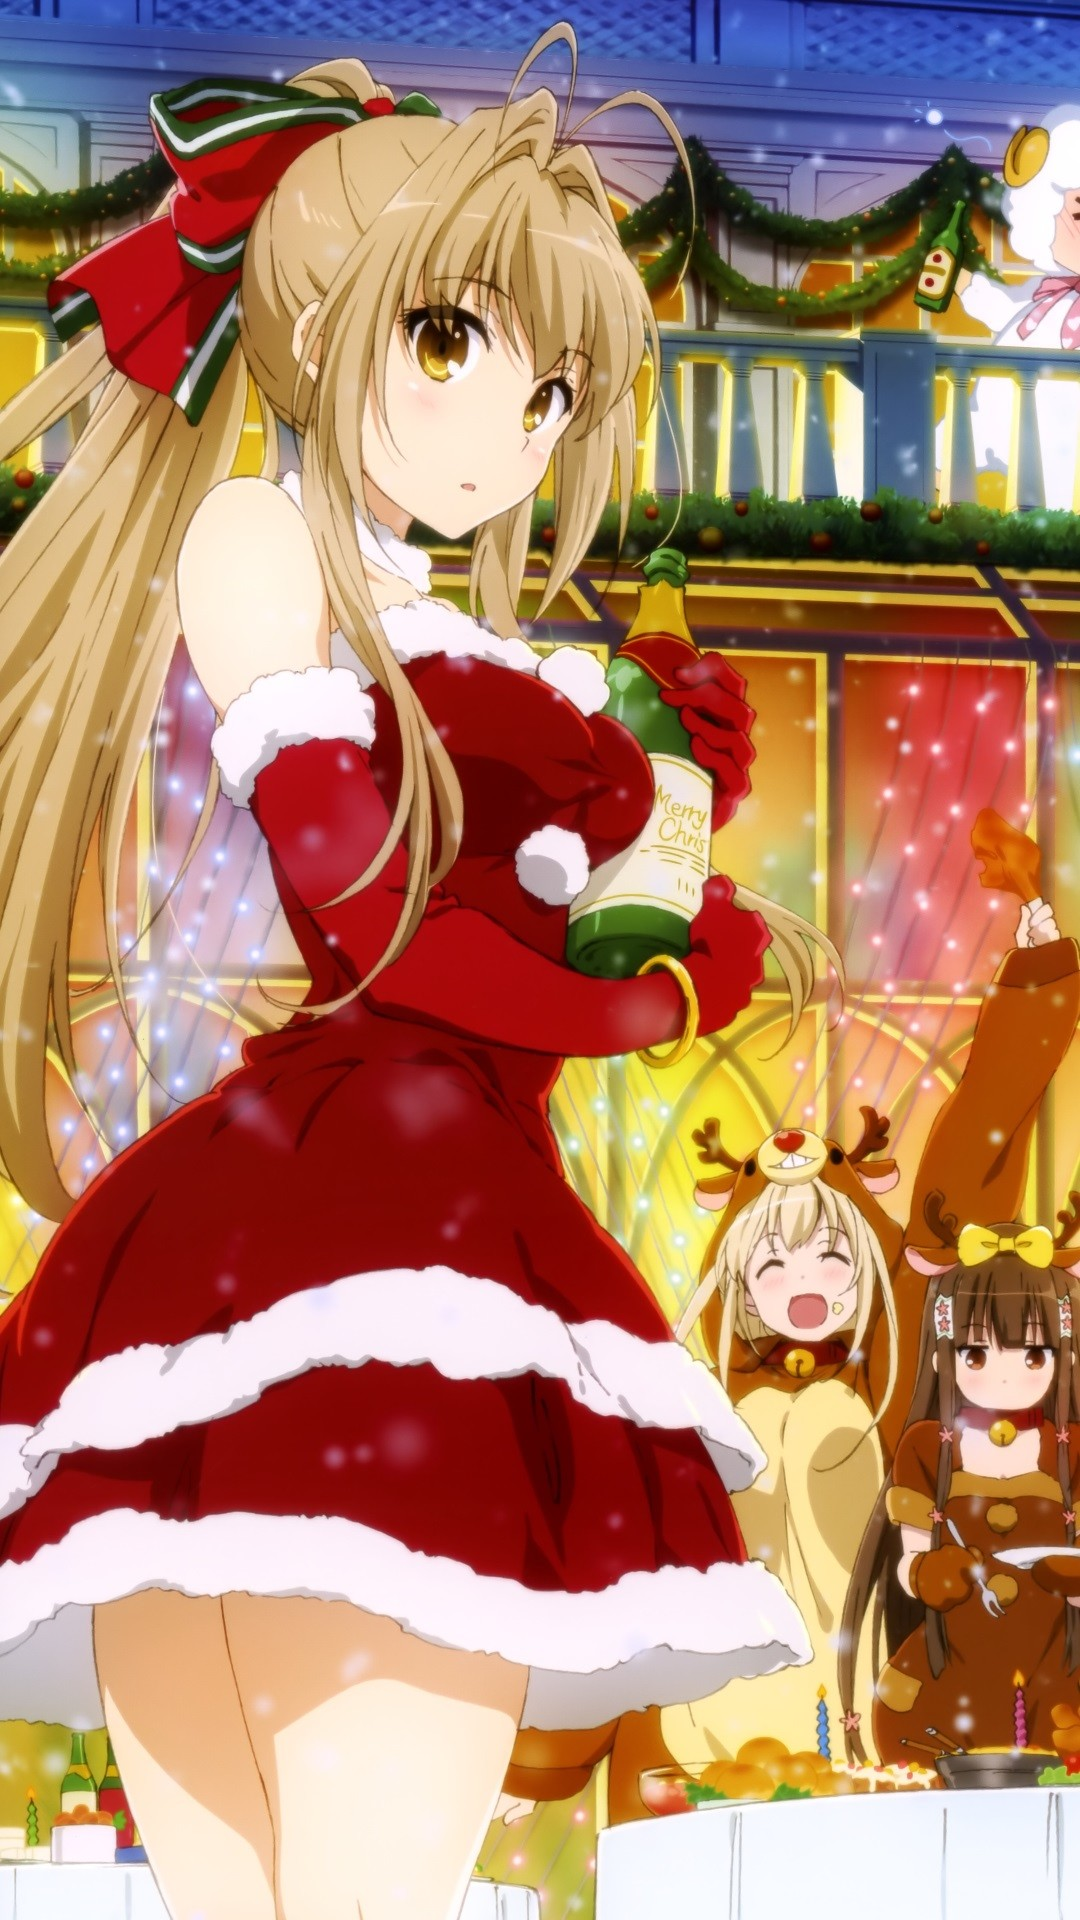 Christmas 2015 anime Amagi Brilliant Park.Samsung Galaxy S4 wallpaper  1080×1920